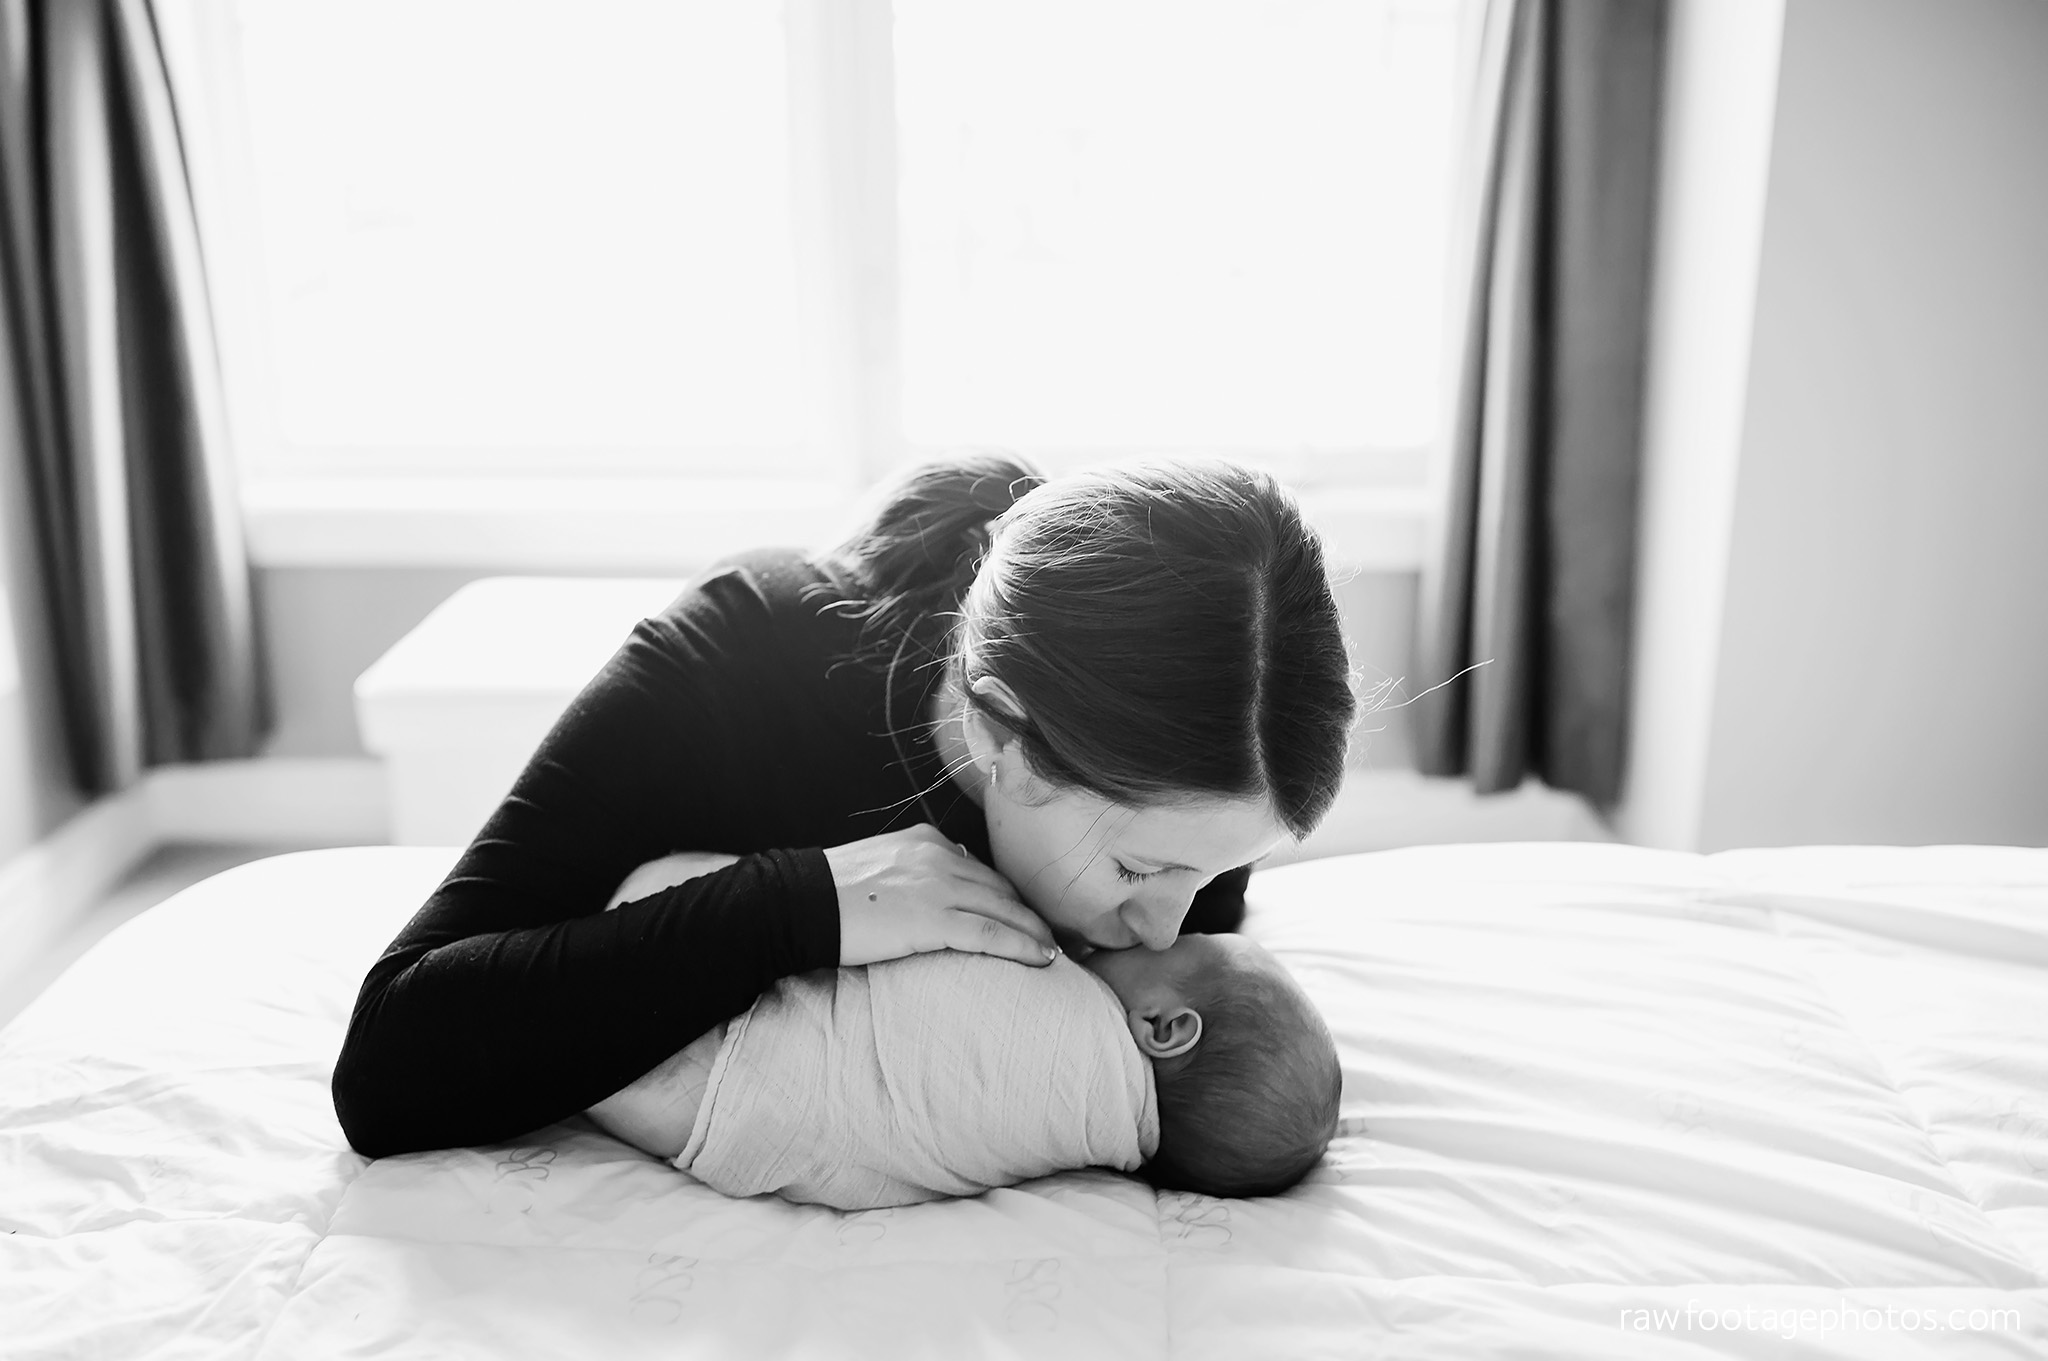 london_ontario_newborn_lifestyle_photographer-baby_nate-raw_footage_photography039.jpg